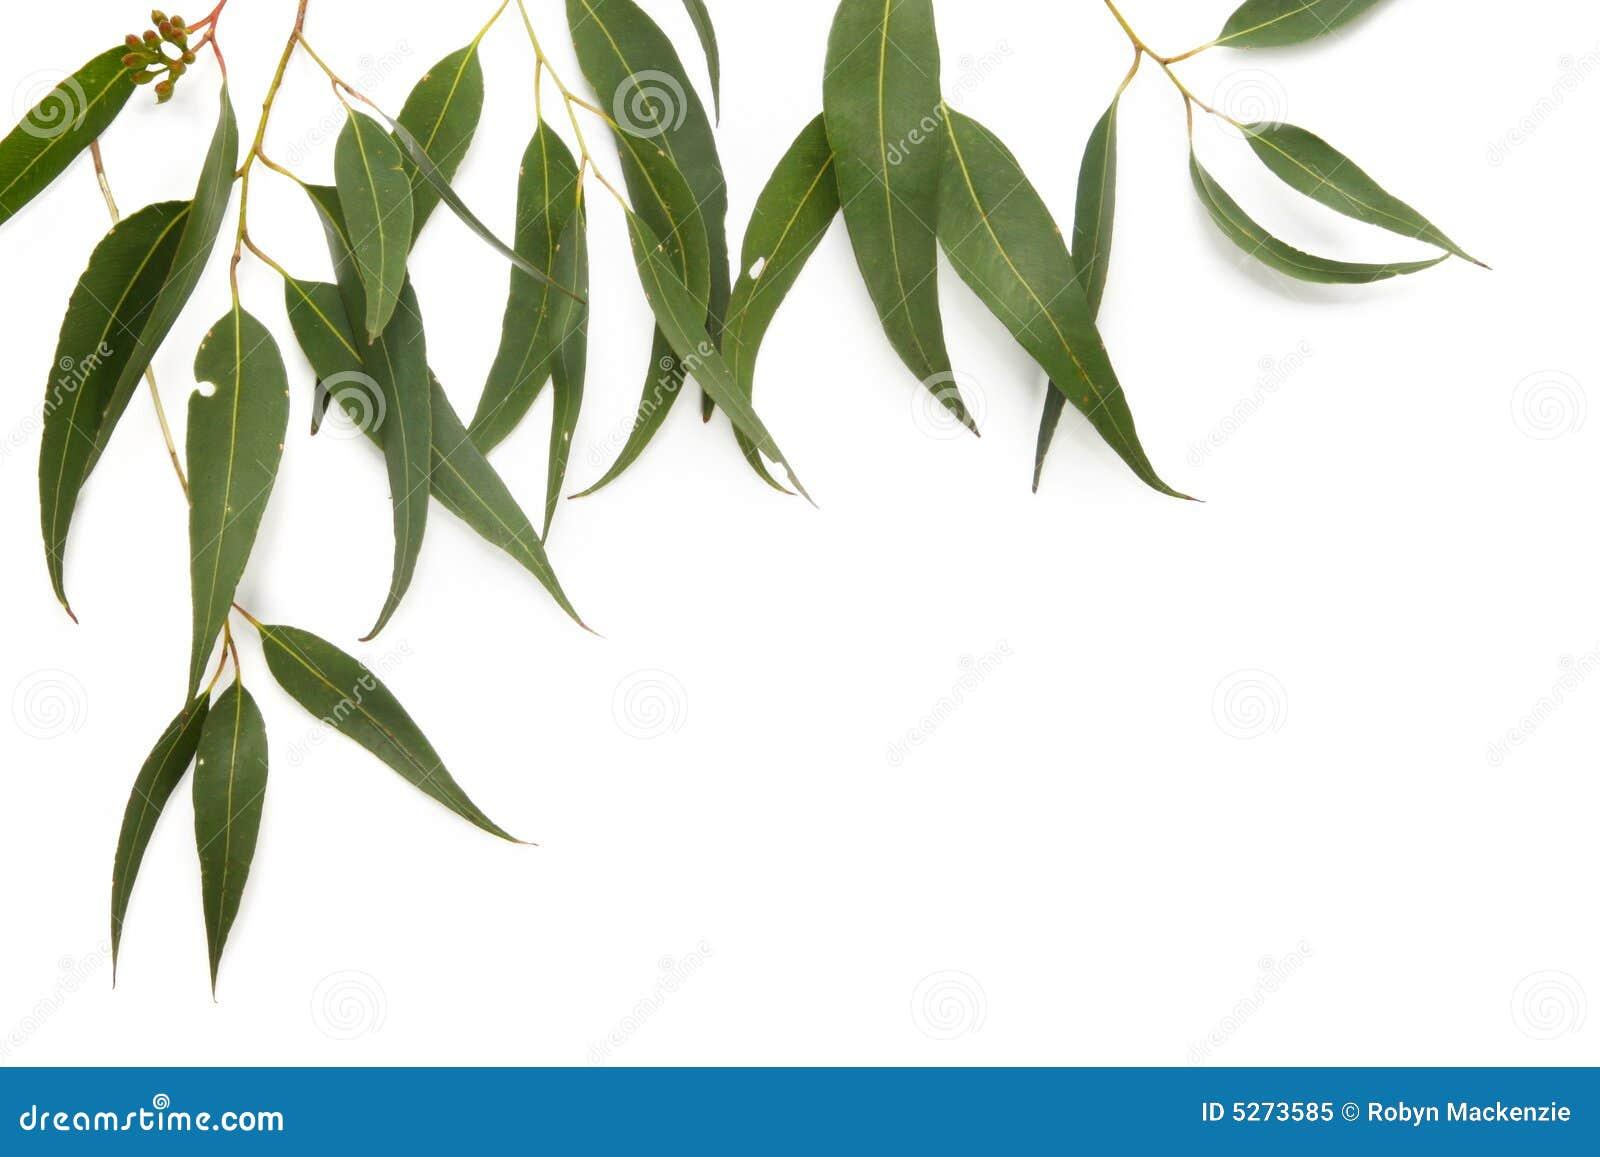 clipart gum leaves - photo #27